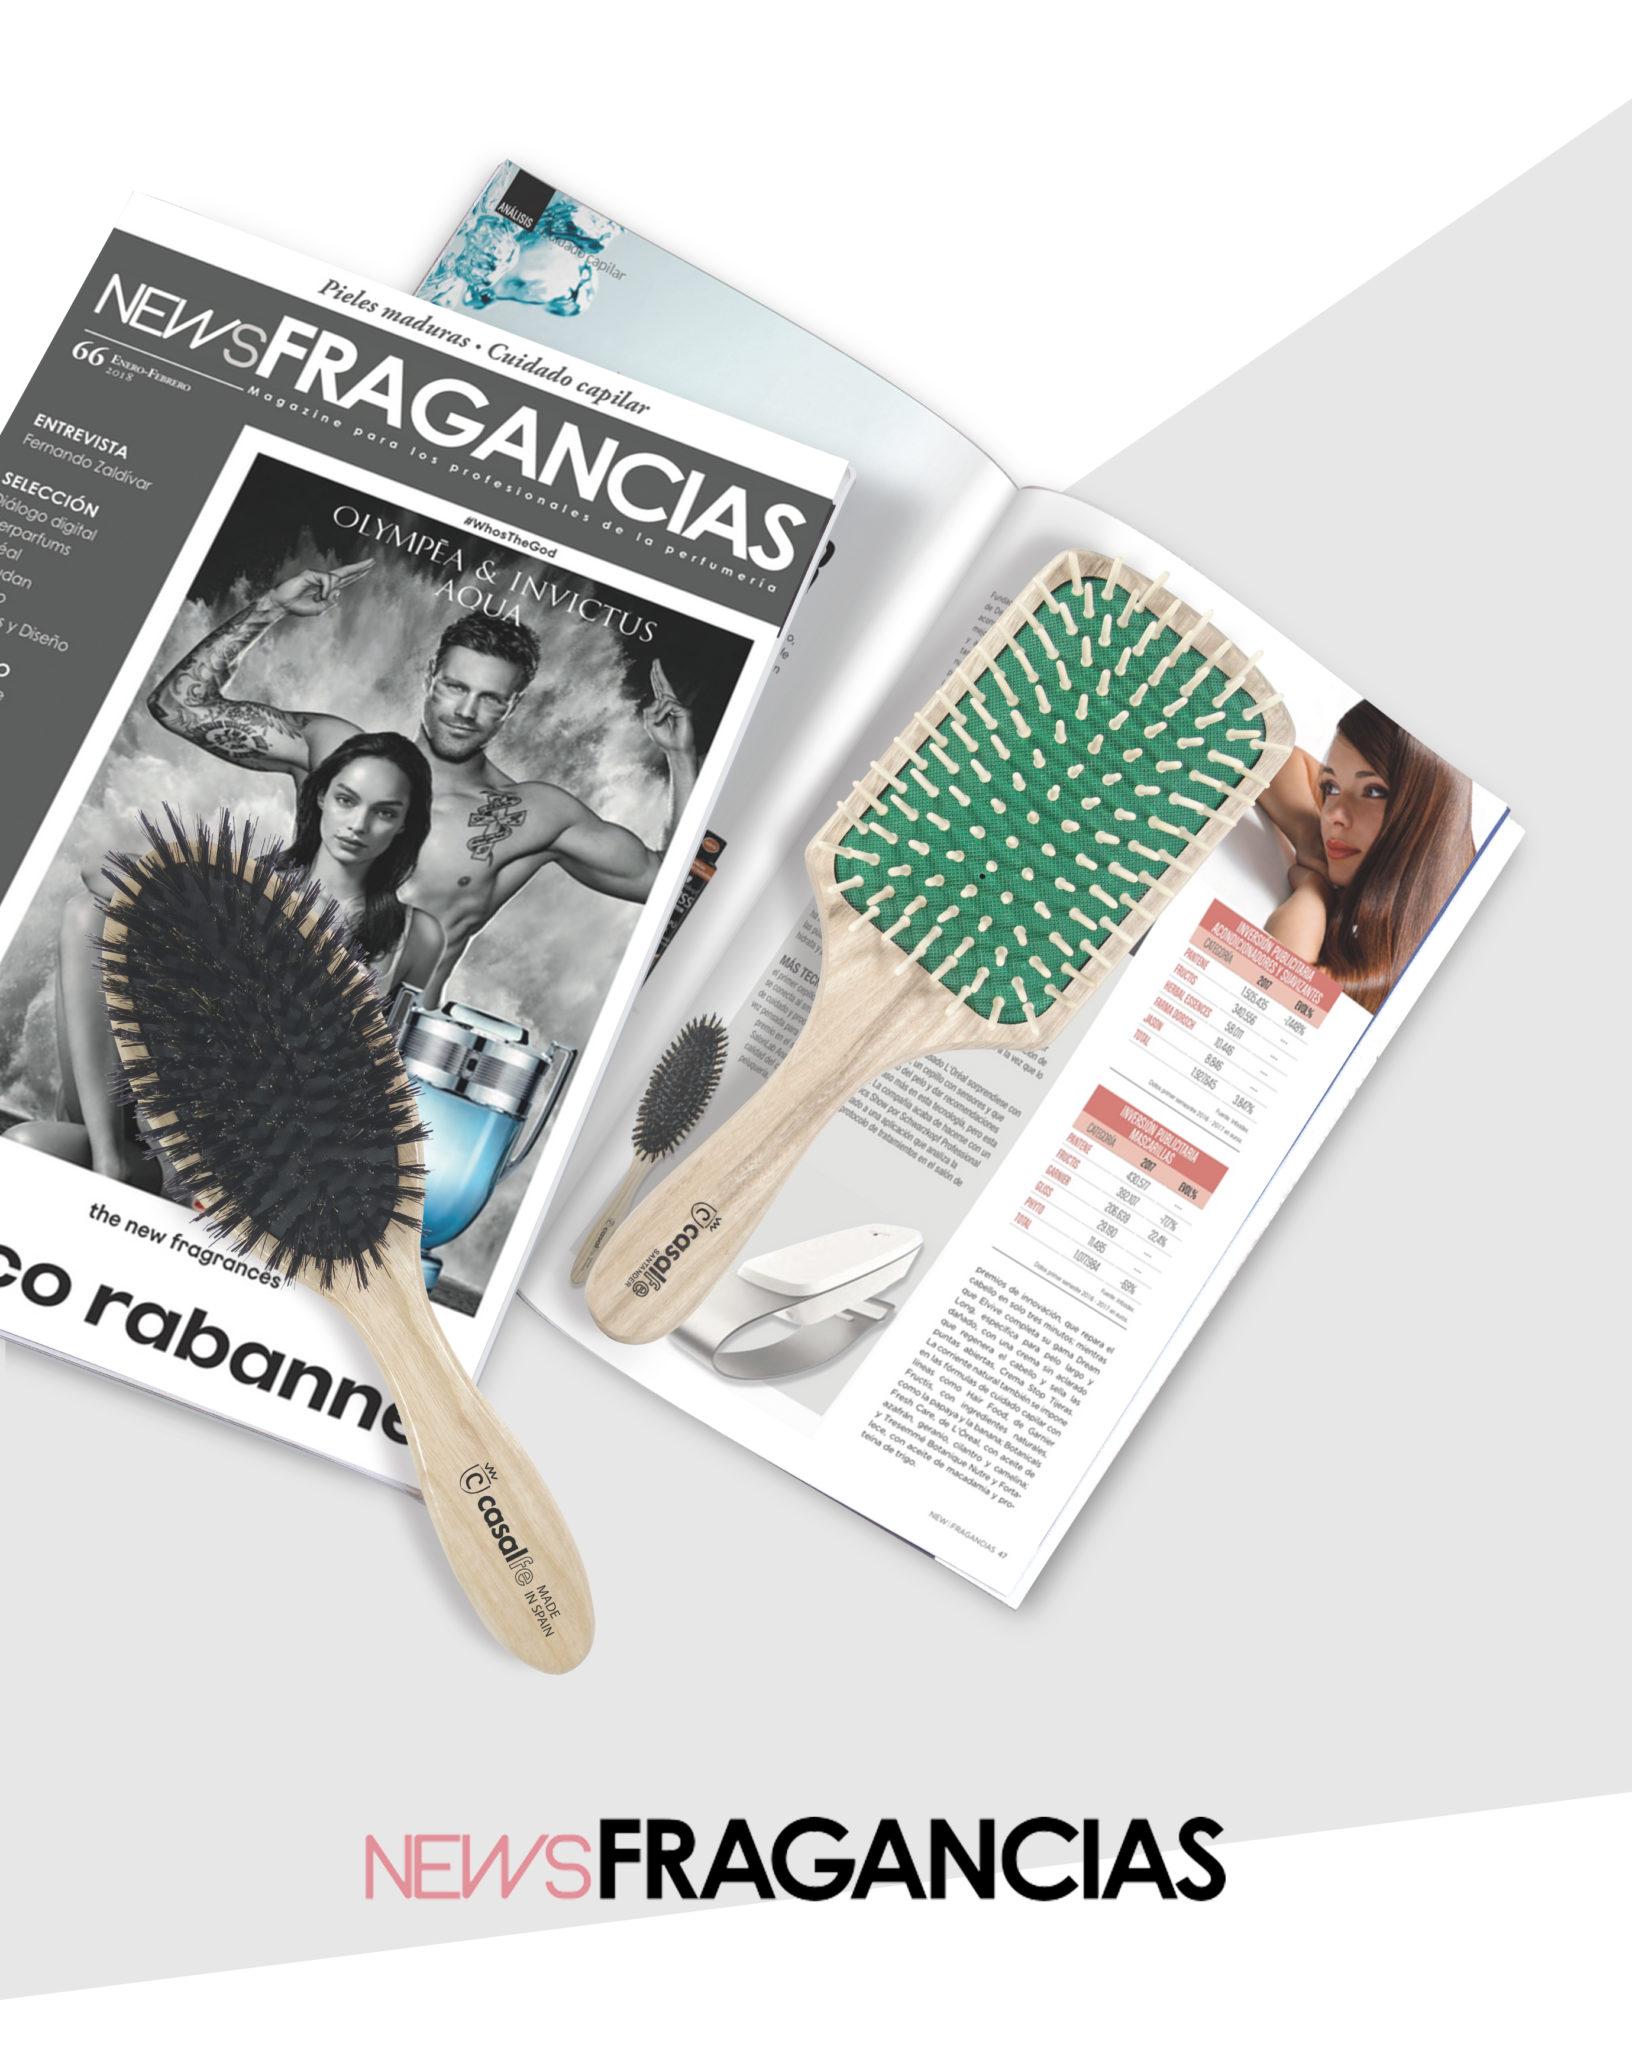 cepillo oval jabali madera newsfragancias 17